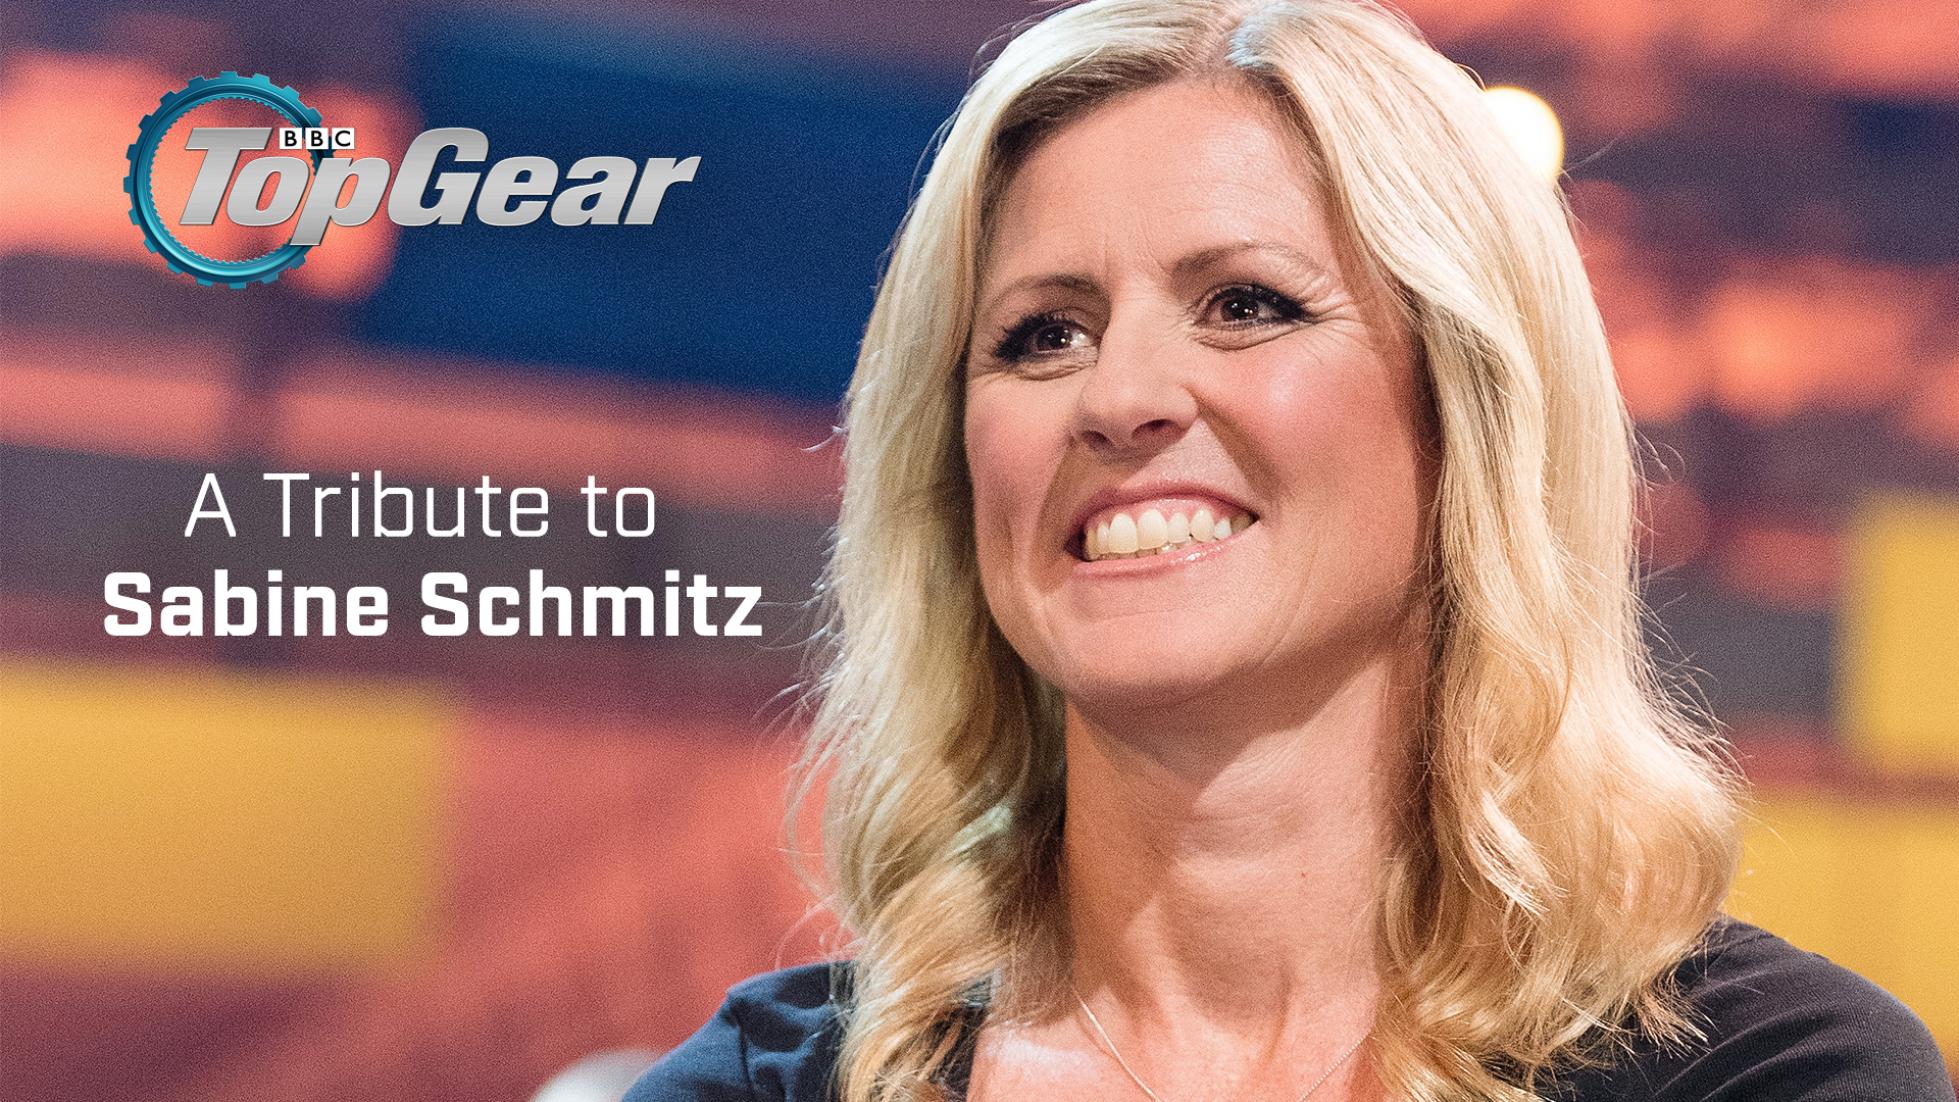 A tribute to Sabine Schmitz